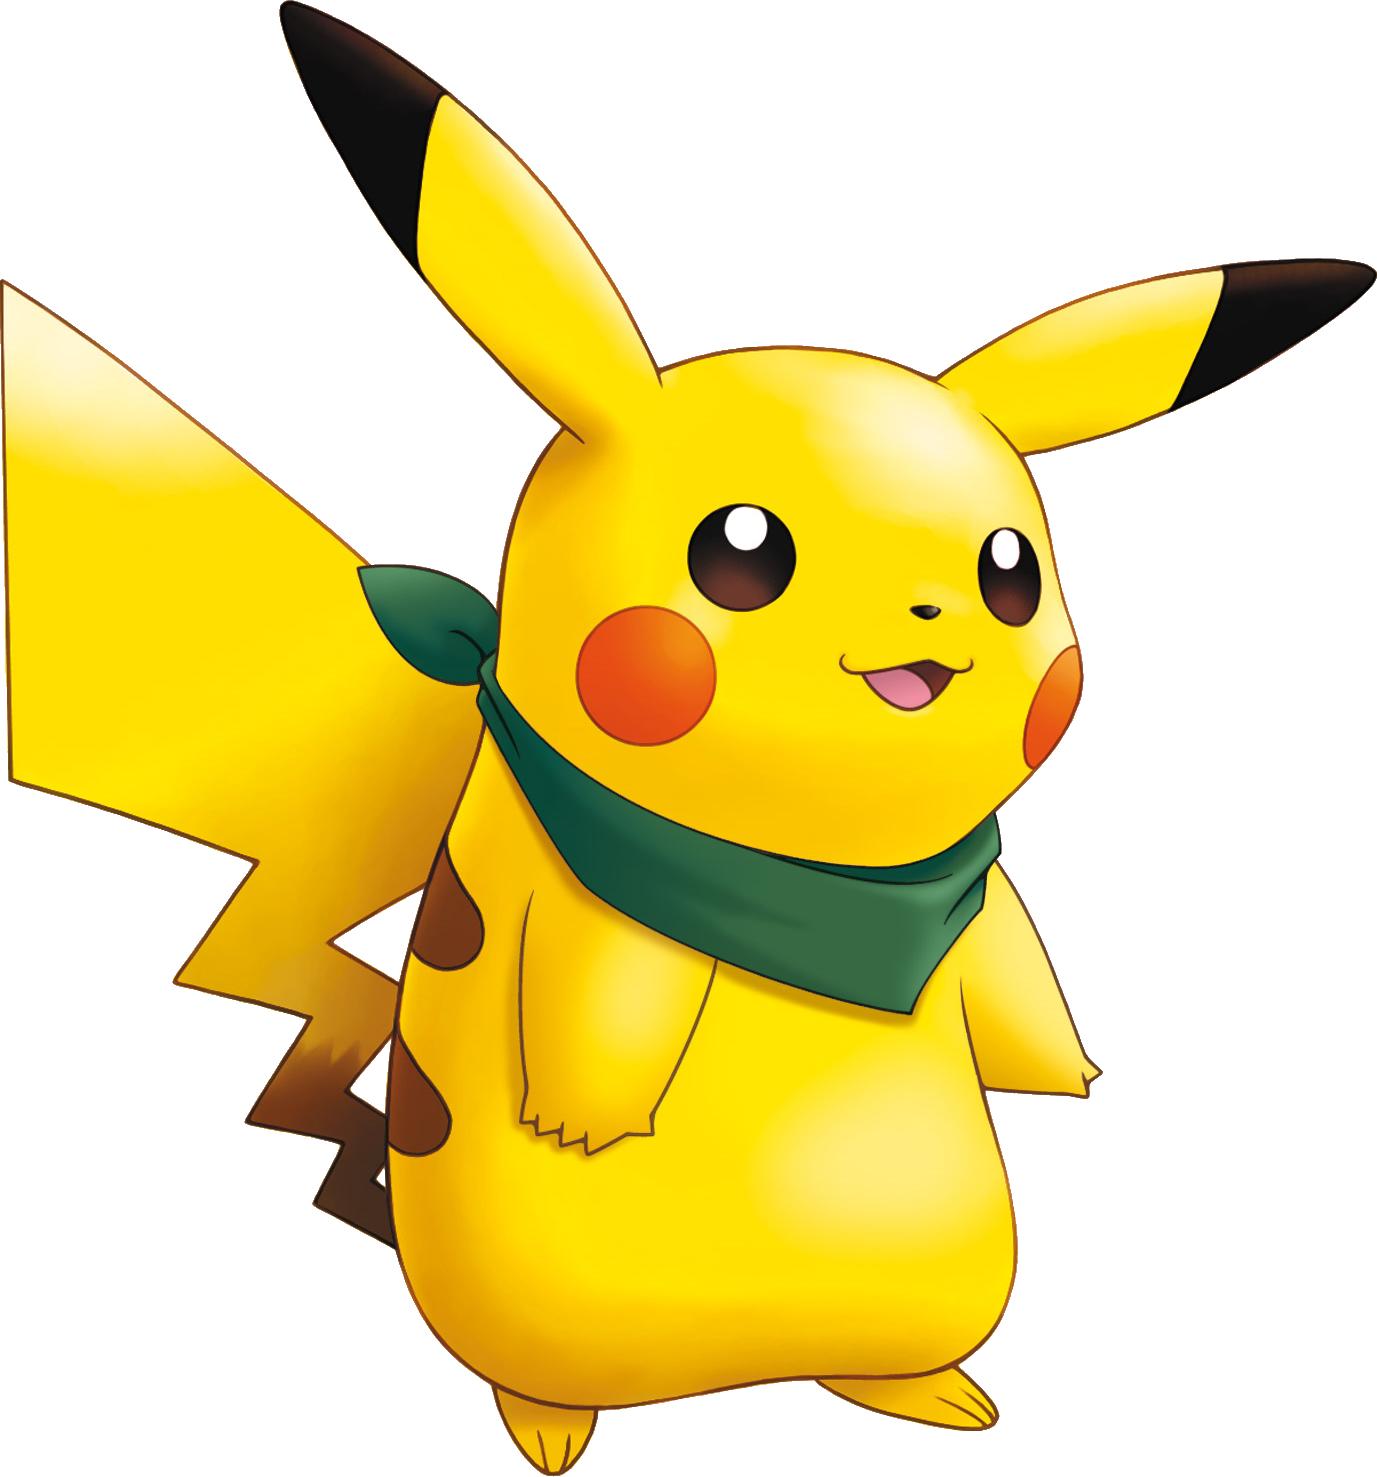 Image - 025Pikachu Pokemon Mystery Dungeon Explorers Of Sky.png | Pokémon  Wiki | FANDOM Powered By Wikia - Pokemon HD PNG